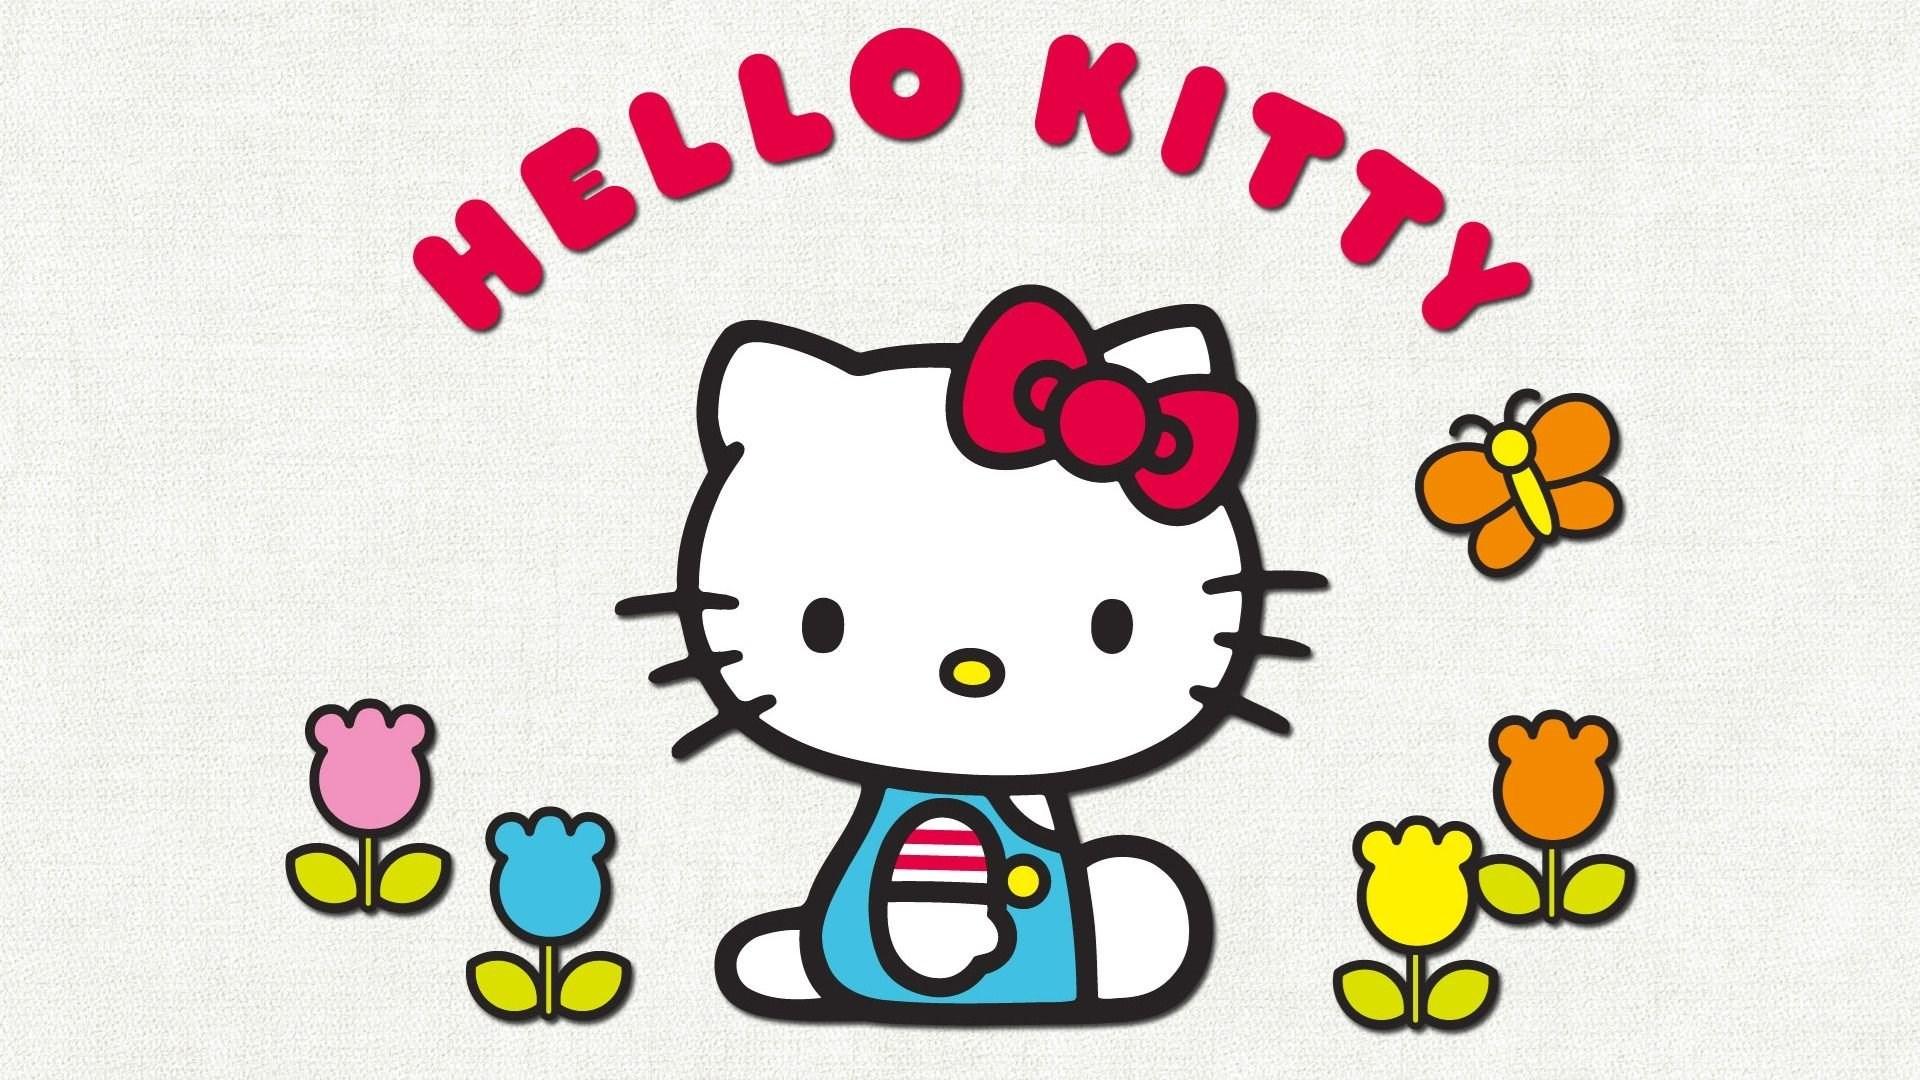 Good Wallpaper Hello Kitty Head - 222039_cute-hello-kitty-desktop-wallpapers-tulips-cute-wallpapers_1920x1080_h  HD_288495.jpg